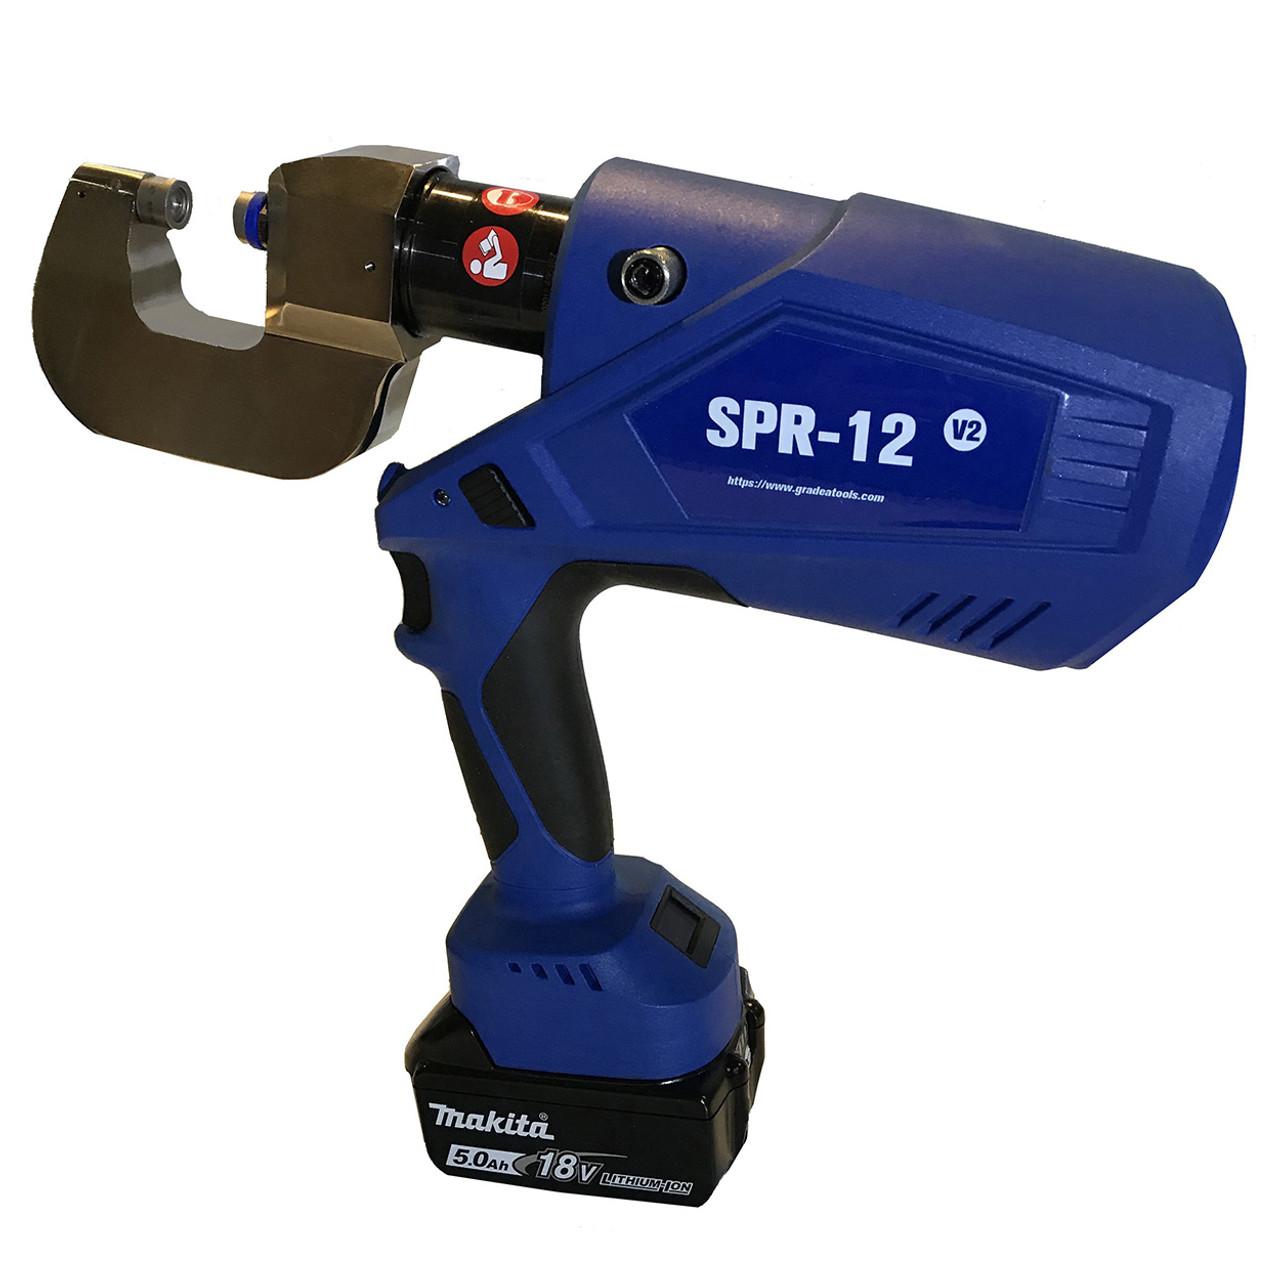 SPR-12 Aluminum Self Piercing Rivet Gun - Combo Kit 36061